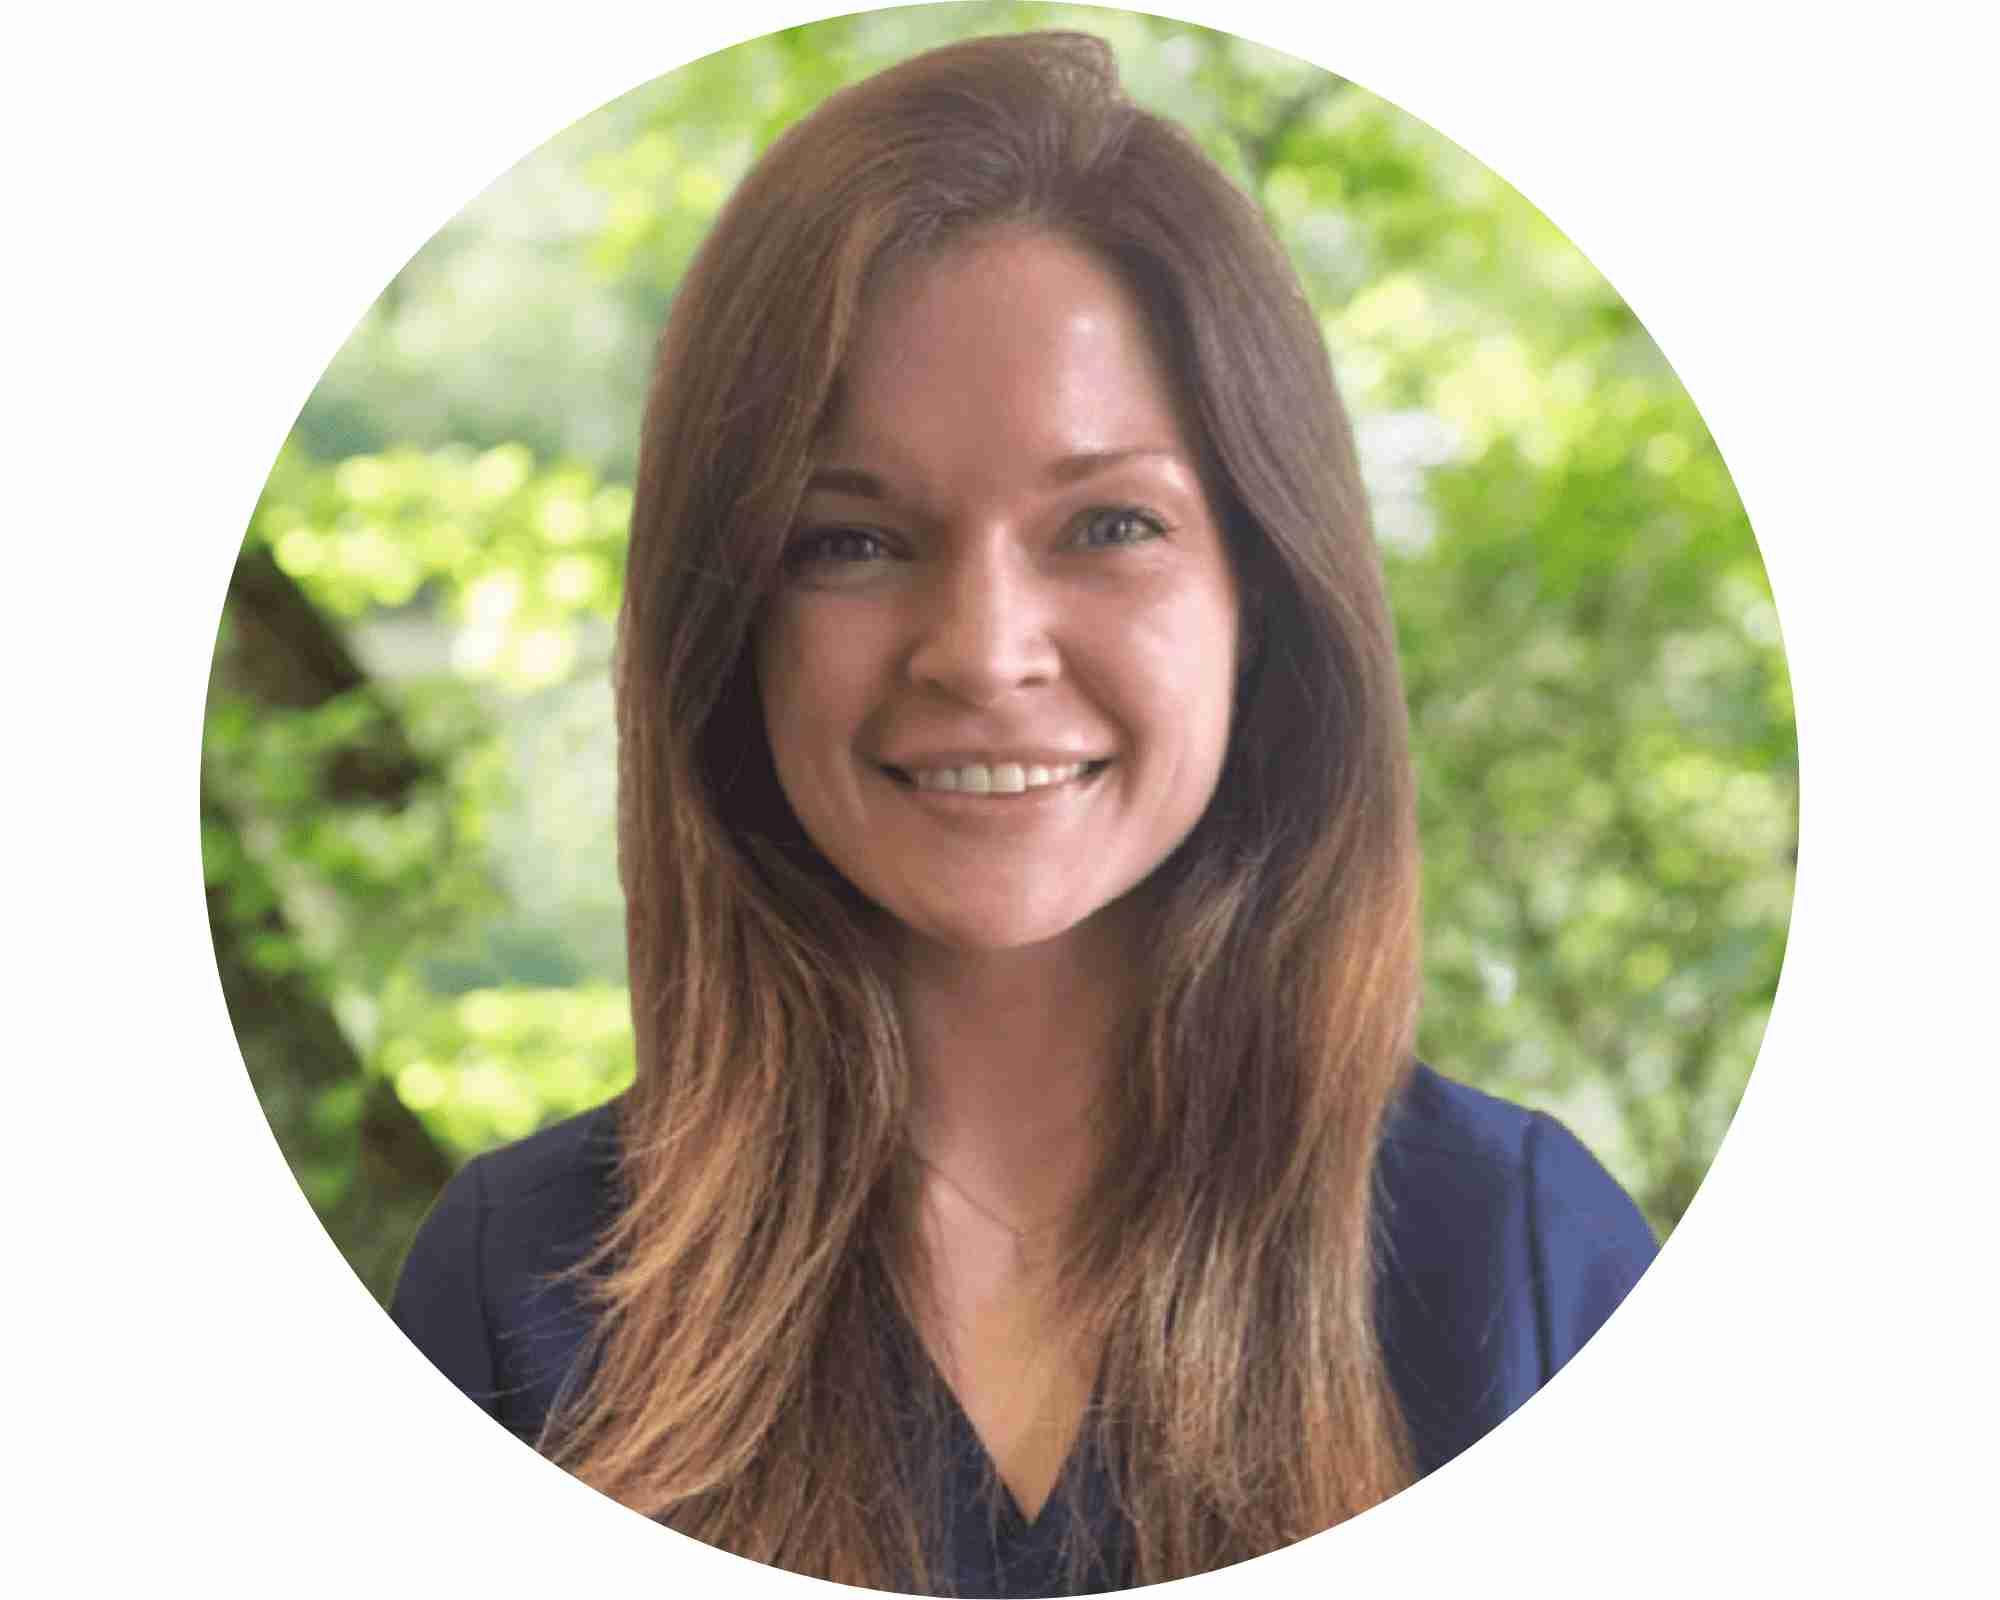 Lauren Melton MS, RDN, LDN